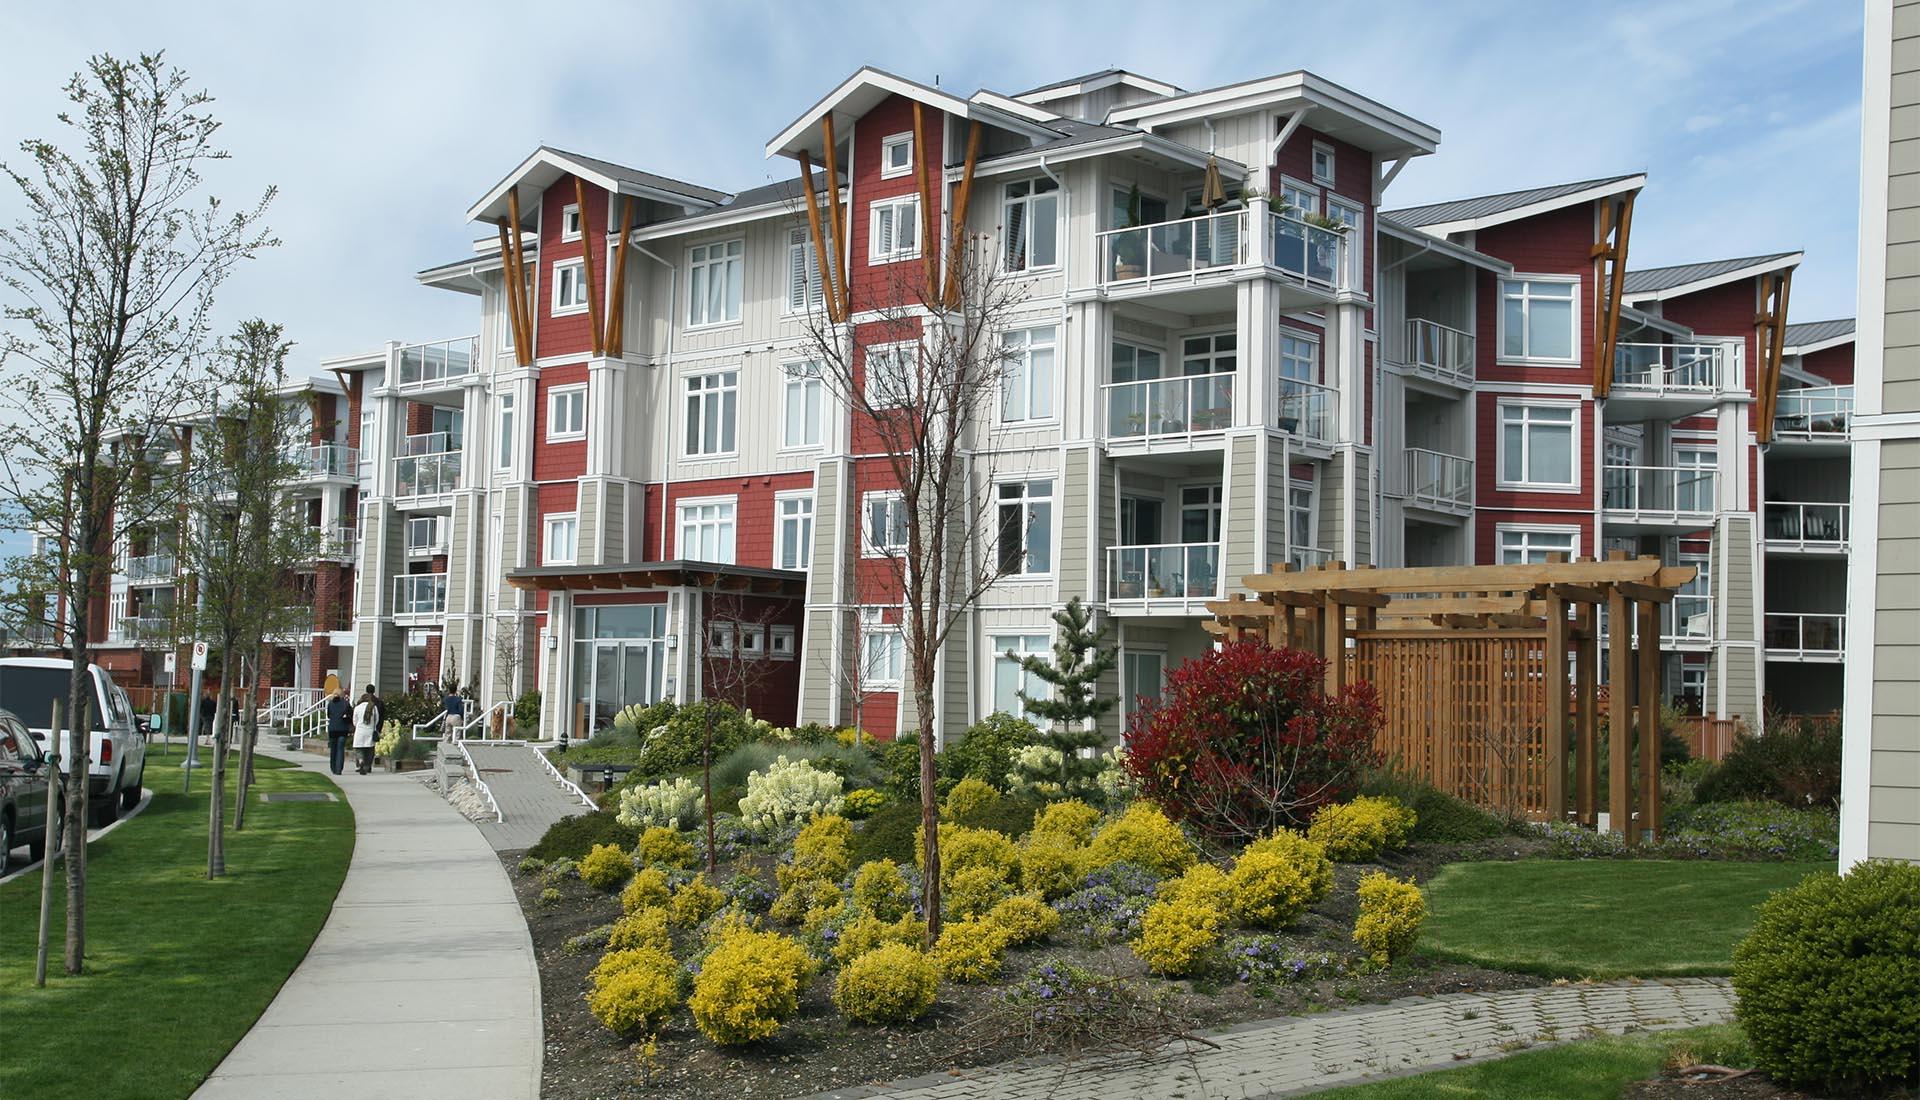 Newly constructed condominium building in suburban setting.